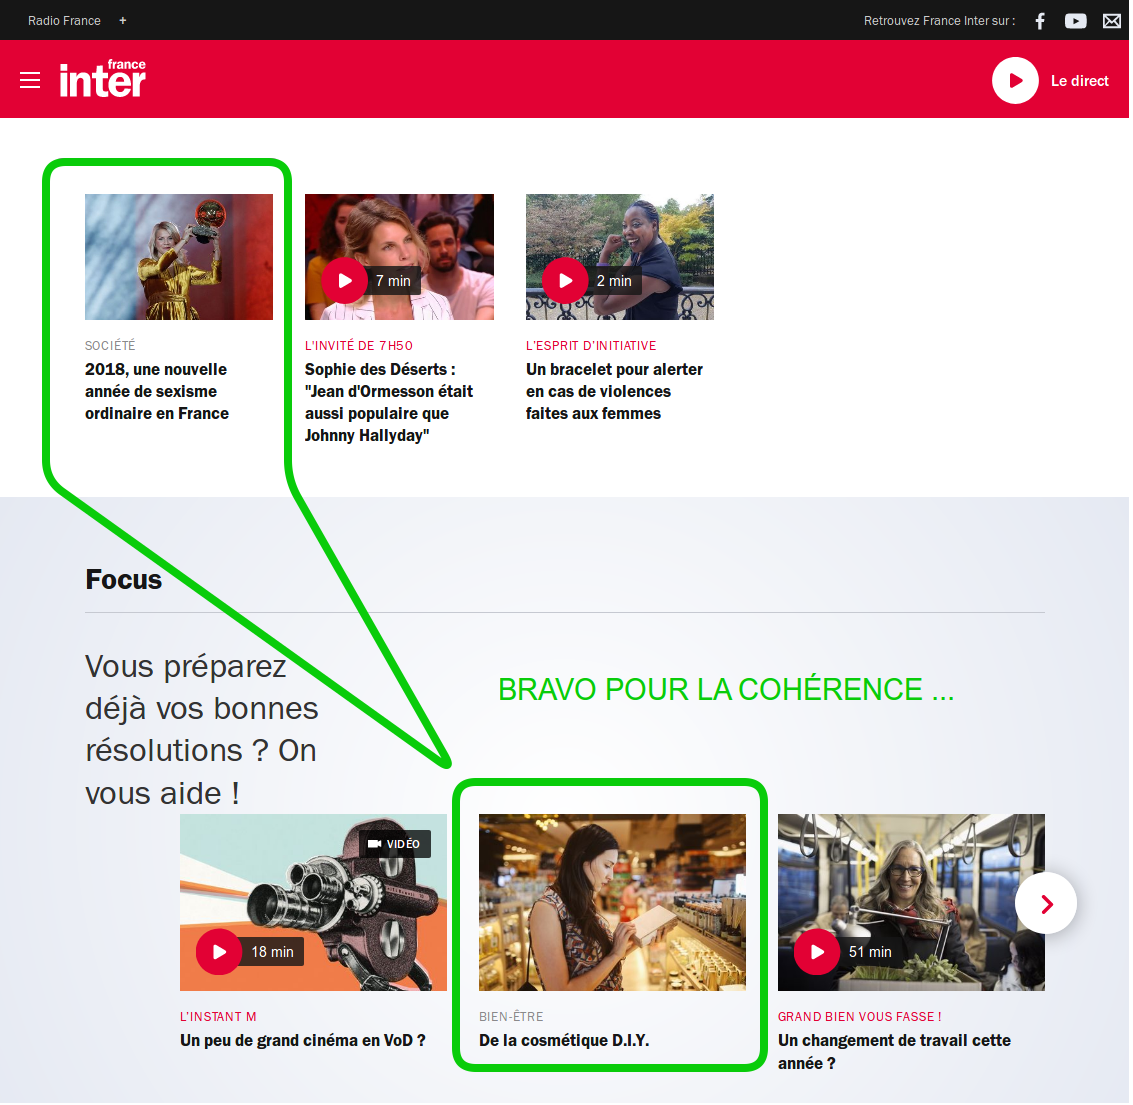 FireShot Capture 004 - France Inter – Info, Culture, Humour, Musique - https___www.franceinter.fr_.png